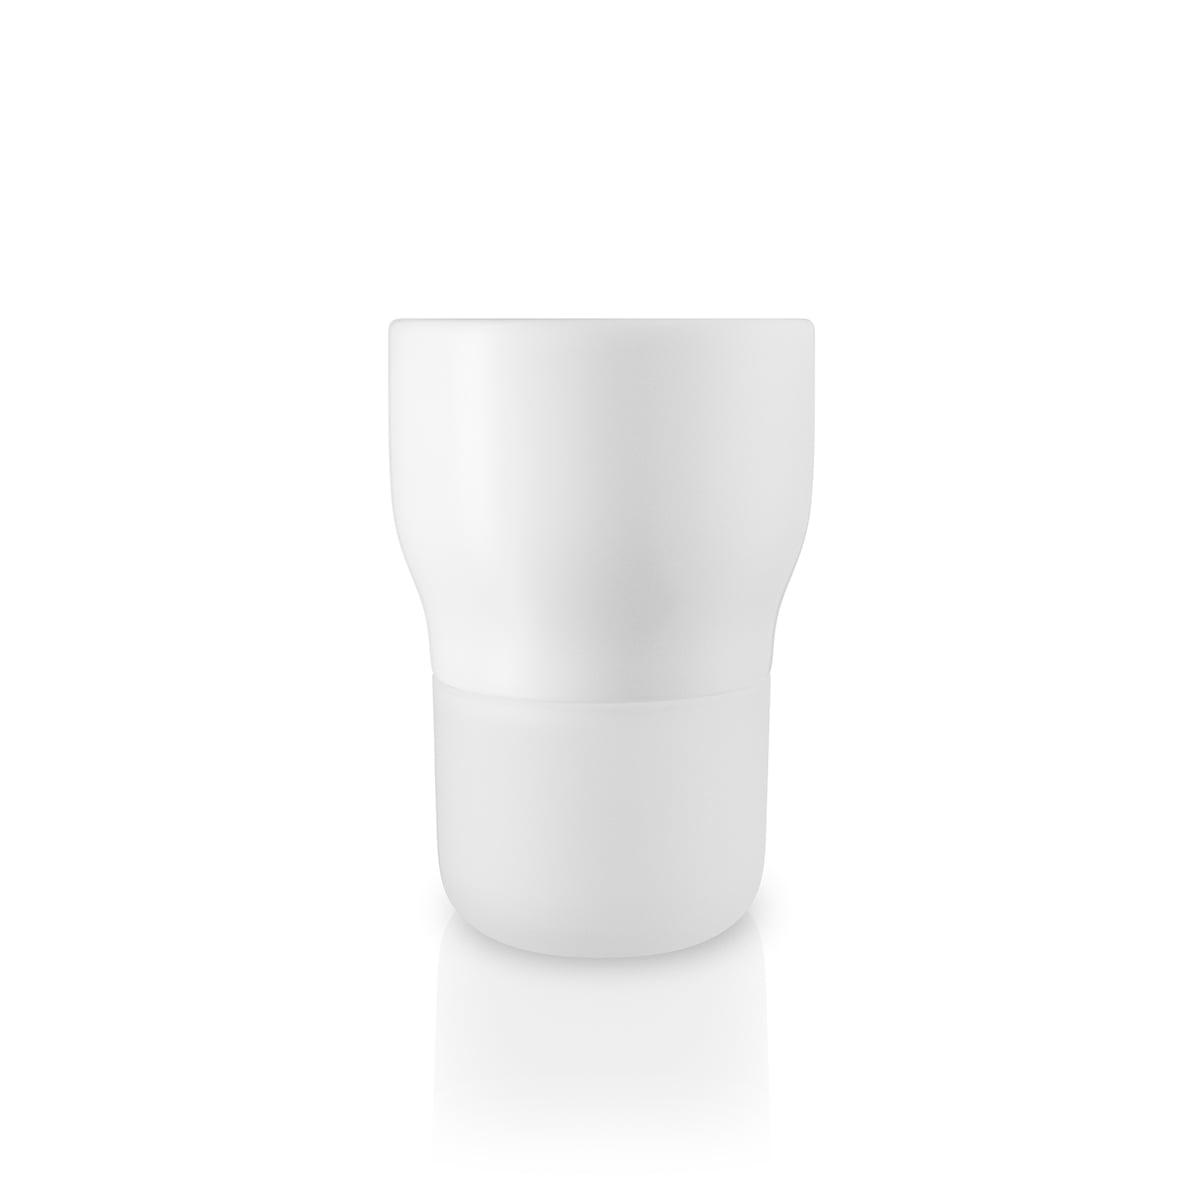 Eva Solo - Selbstbewässernder Kräutertopf, Ø 9 cm / kalkweiß   Garten > Pflanzen > Blumentöpfe   Kalkweiß   Keramik -  glas -  nylon   Eva Solo